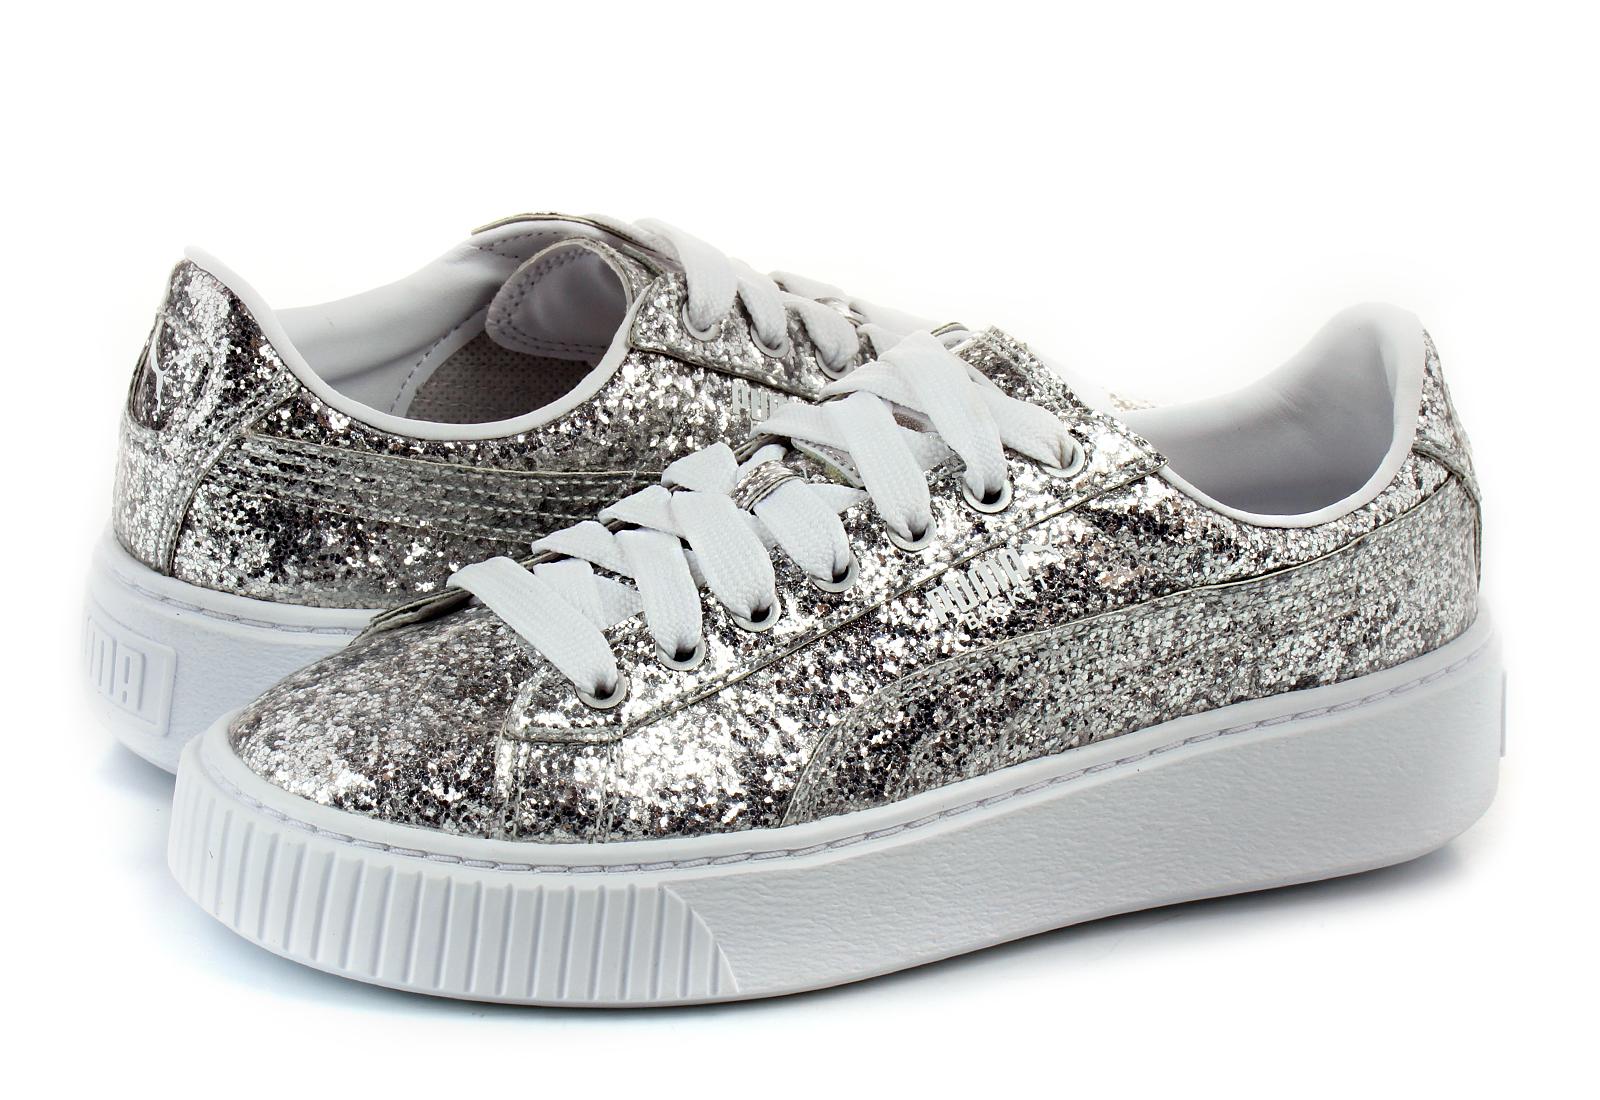 Puma Shoes - Basket Platform Glitter Wns - 36409301-slv - Online ... e8c43654f